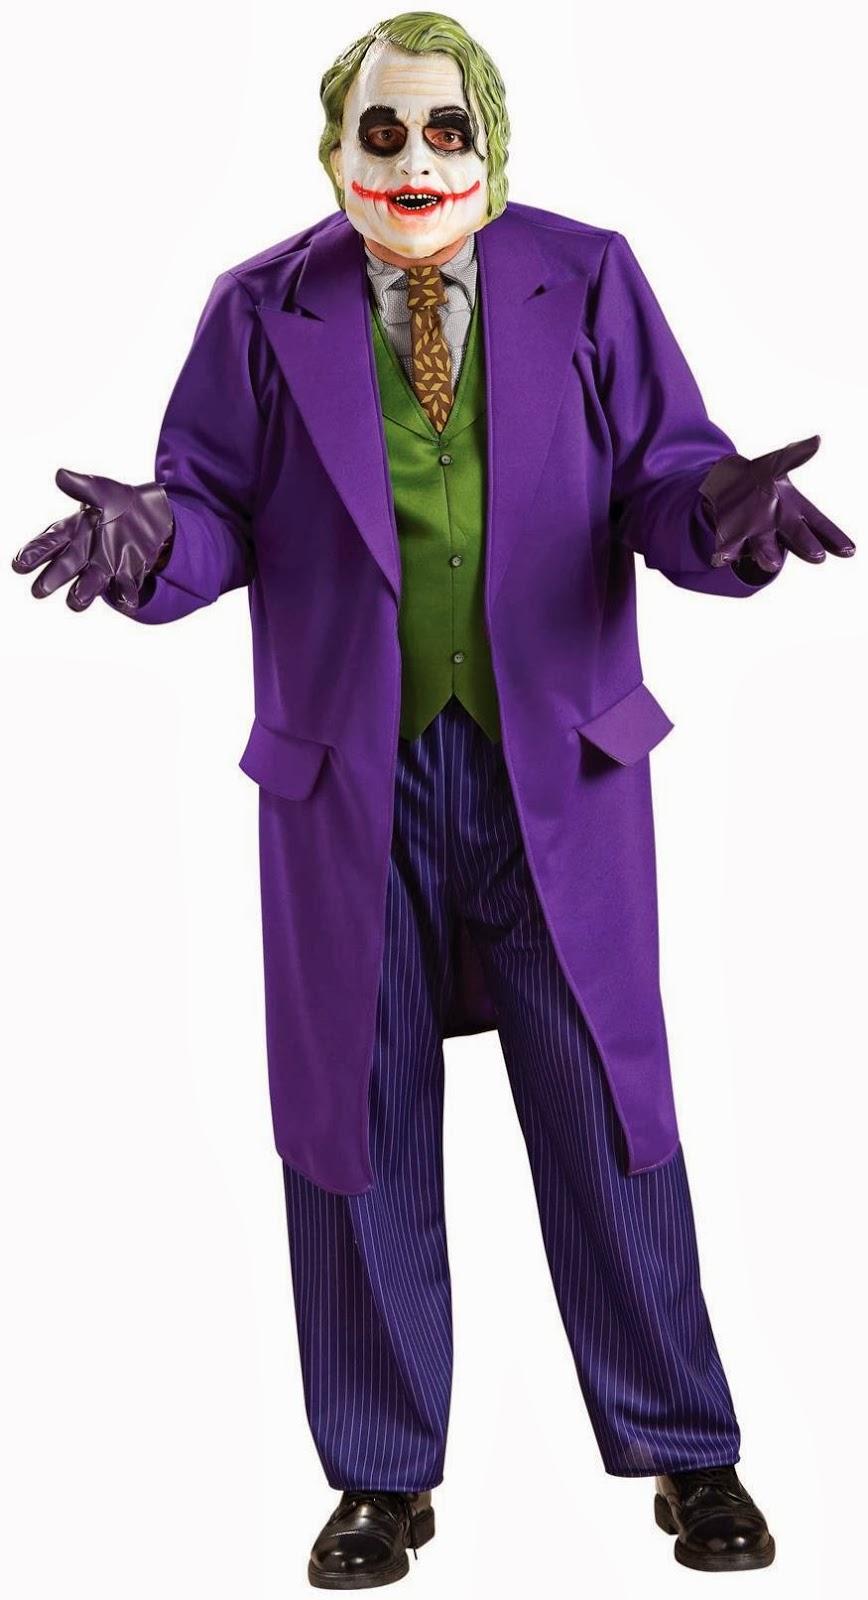 best halloween costume deals halloween scary costumes. Black Bedroom Furniture Sets. Home Design Ideas